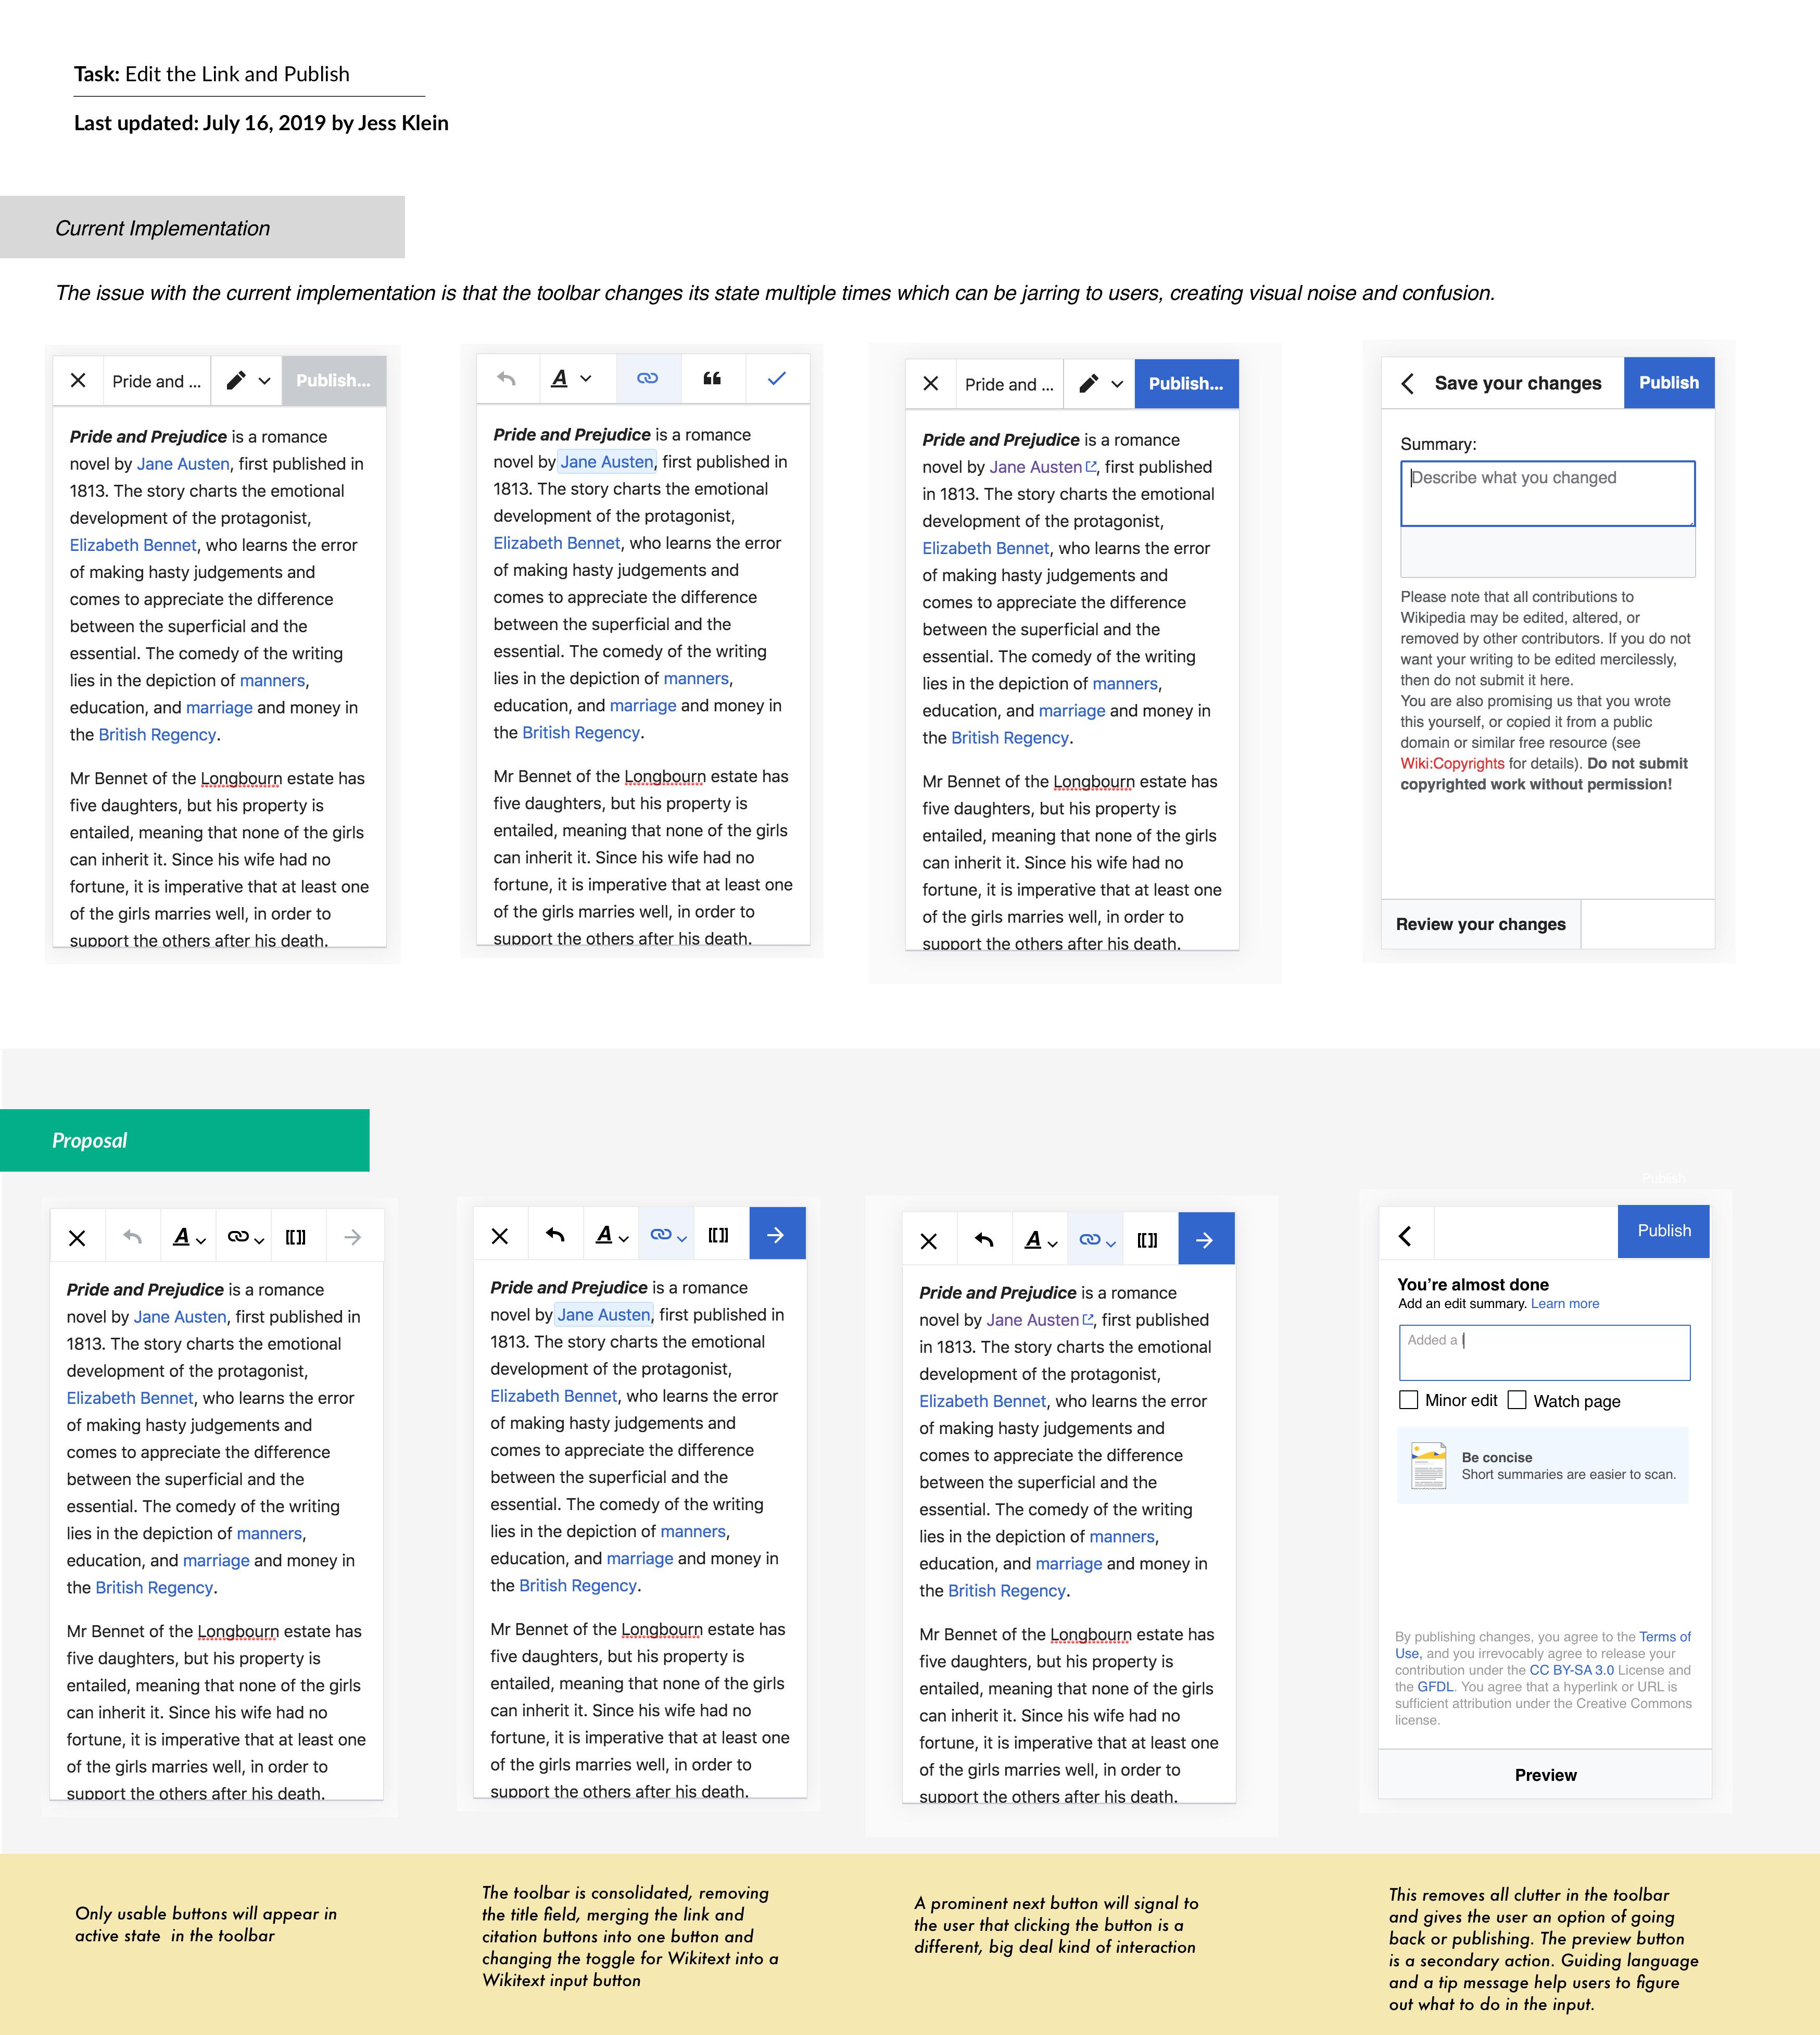 toolbar@2x.png (3×3 px, 1 MB)